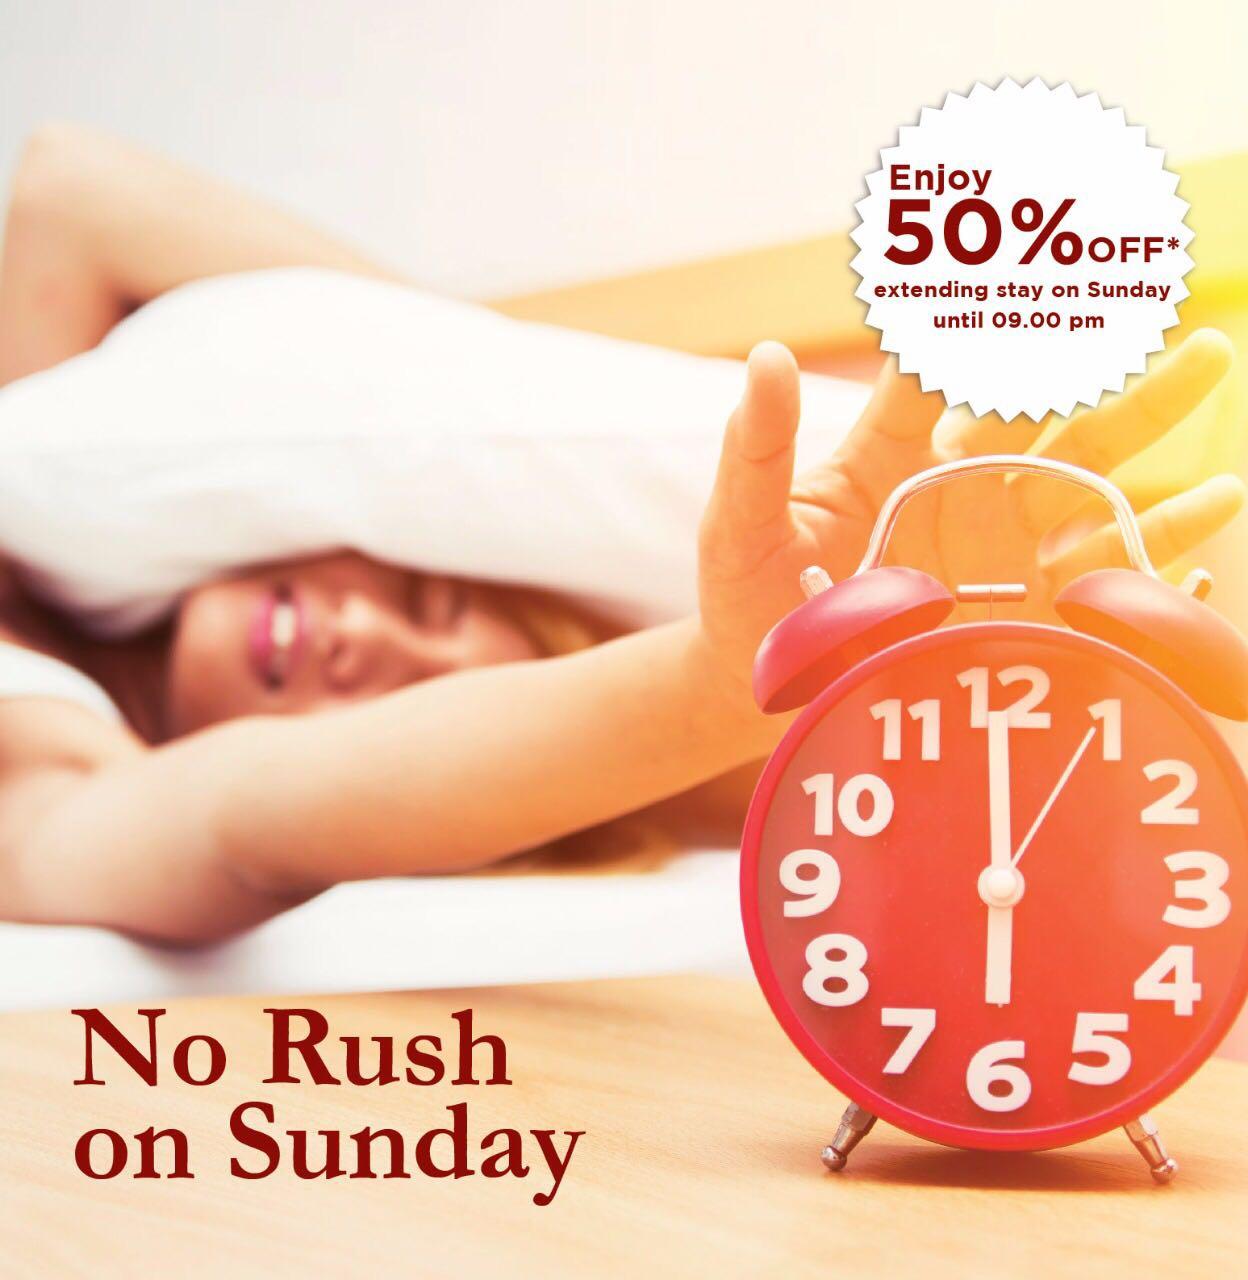 No Rush on Sunday Atria Hotels